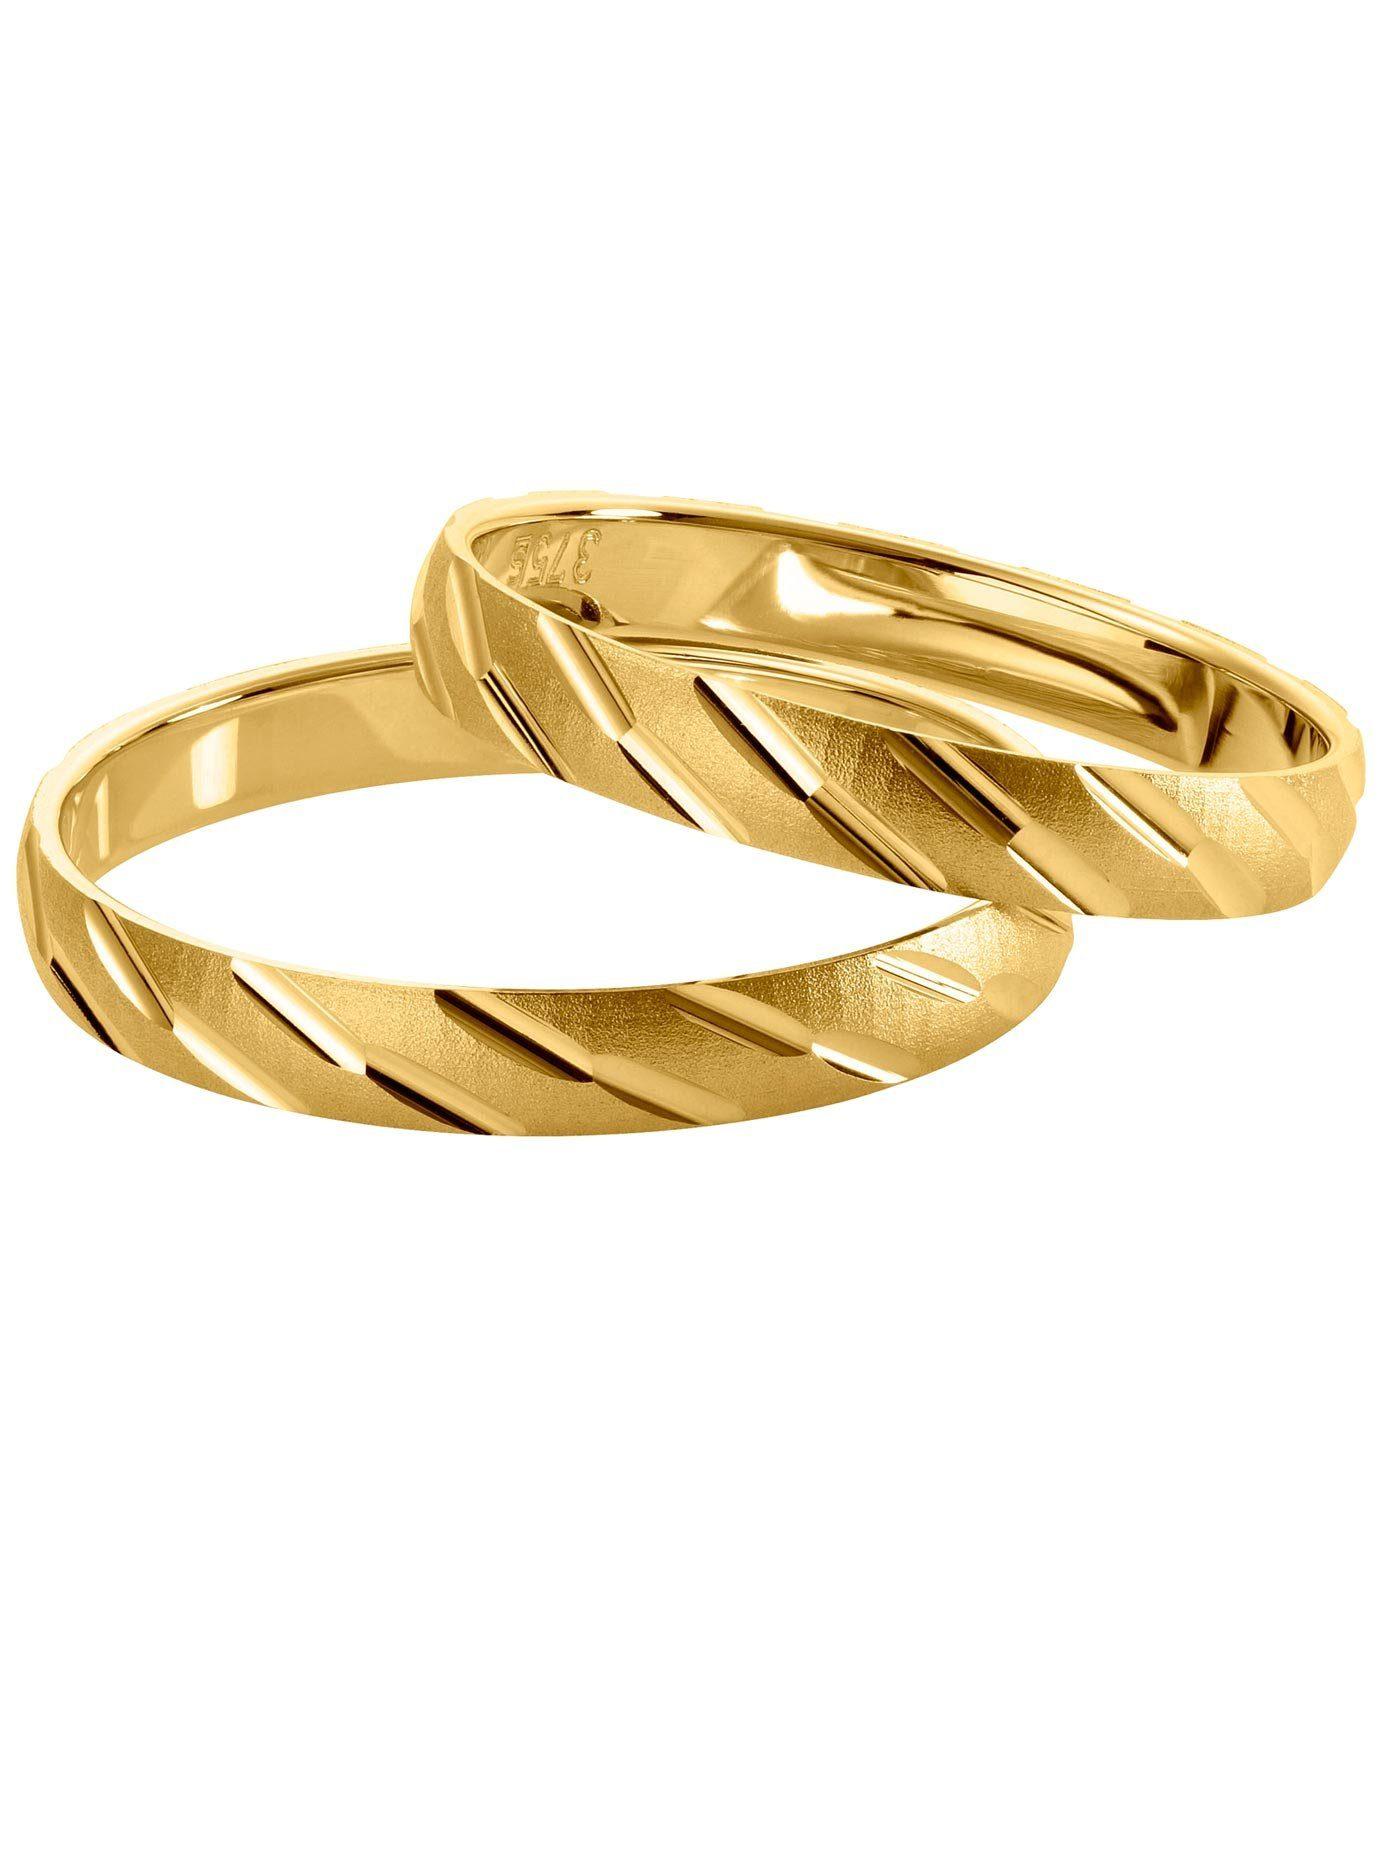 16 mm glänzene goldfarbene Klangkugel aus Messing